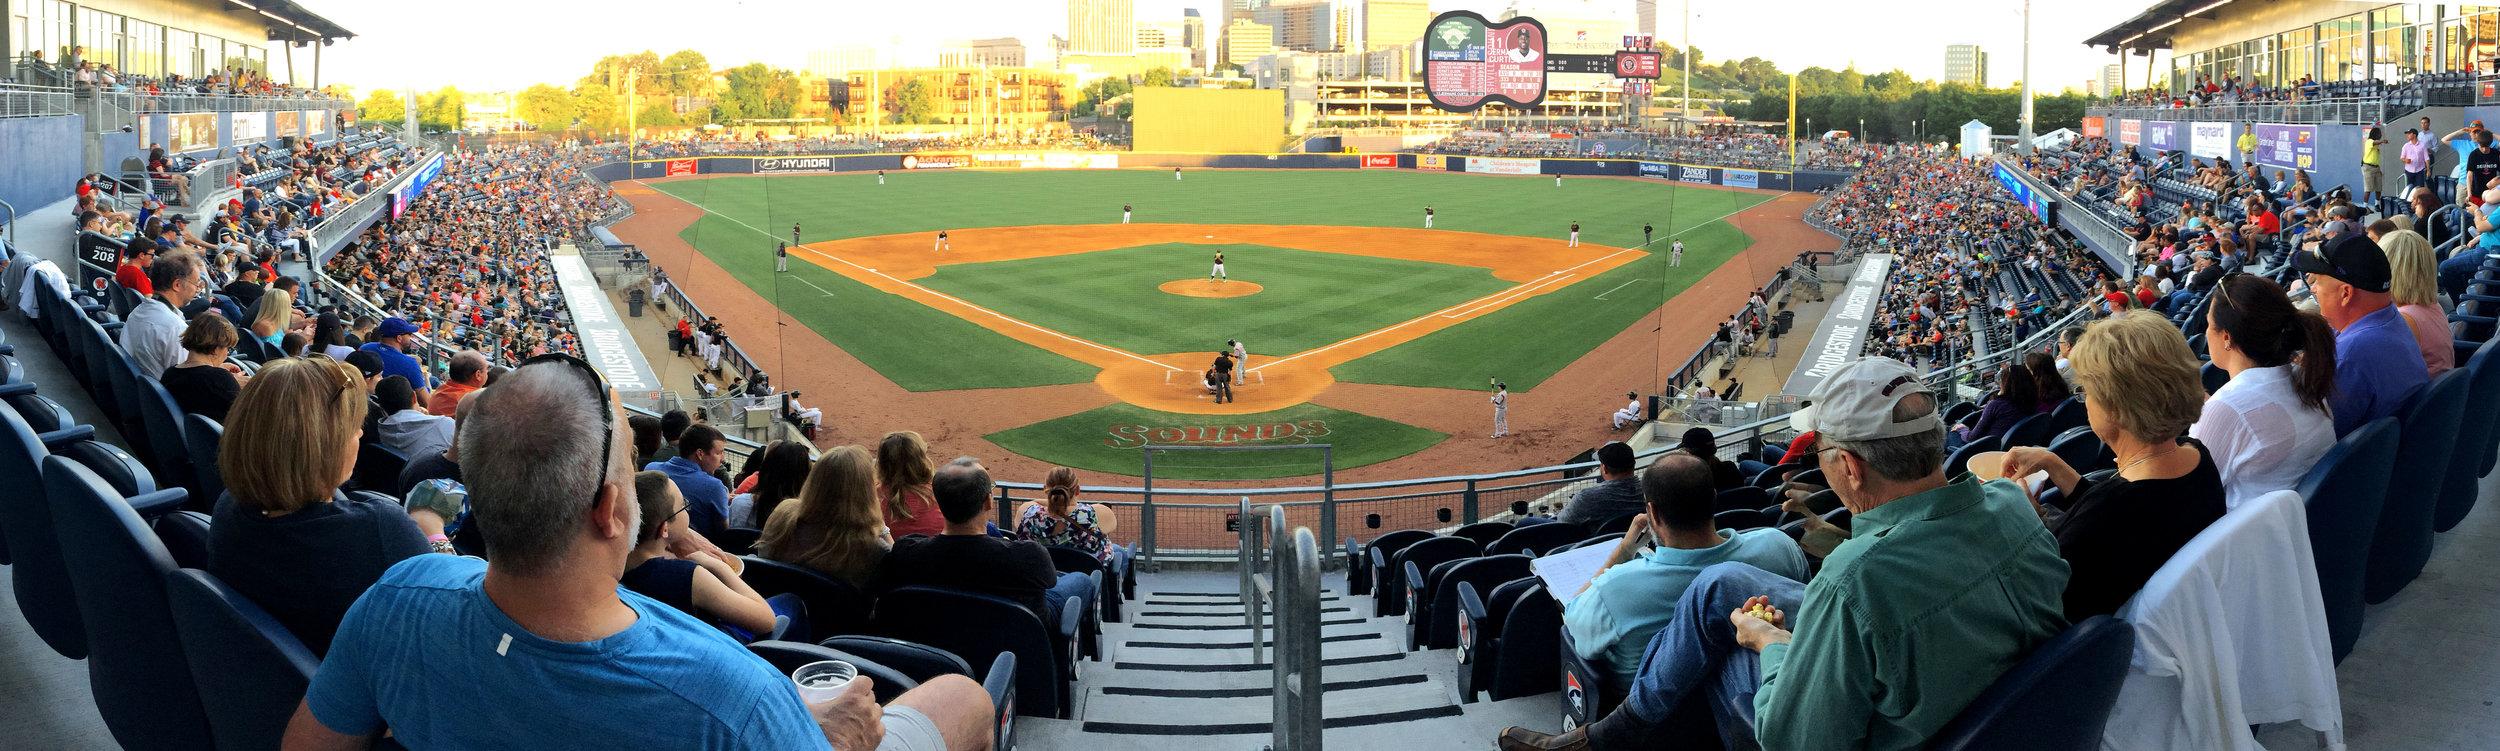 Ballpark Pano 1.jpg